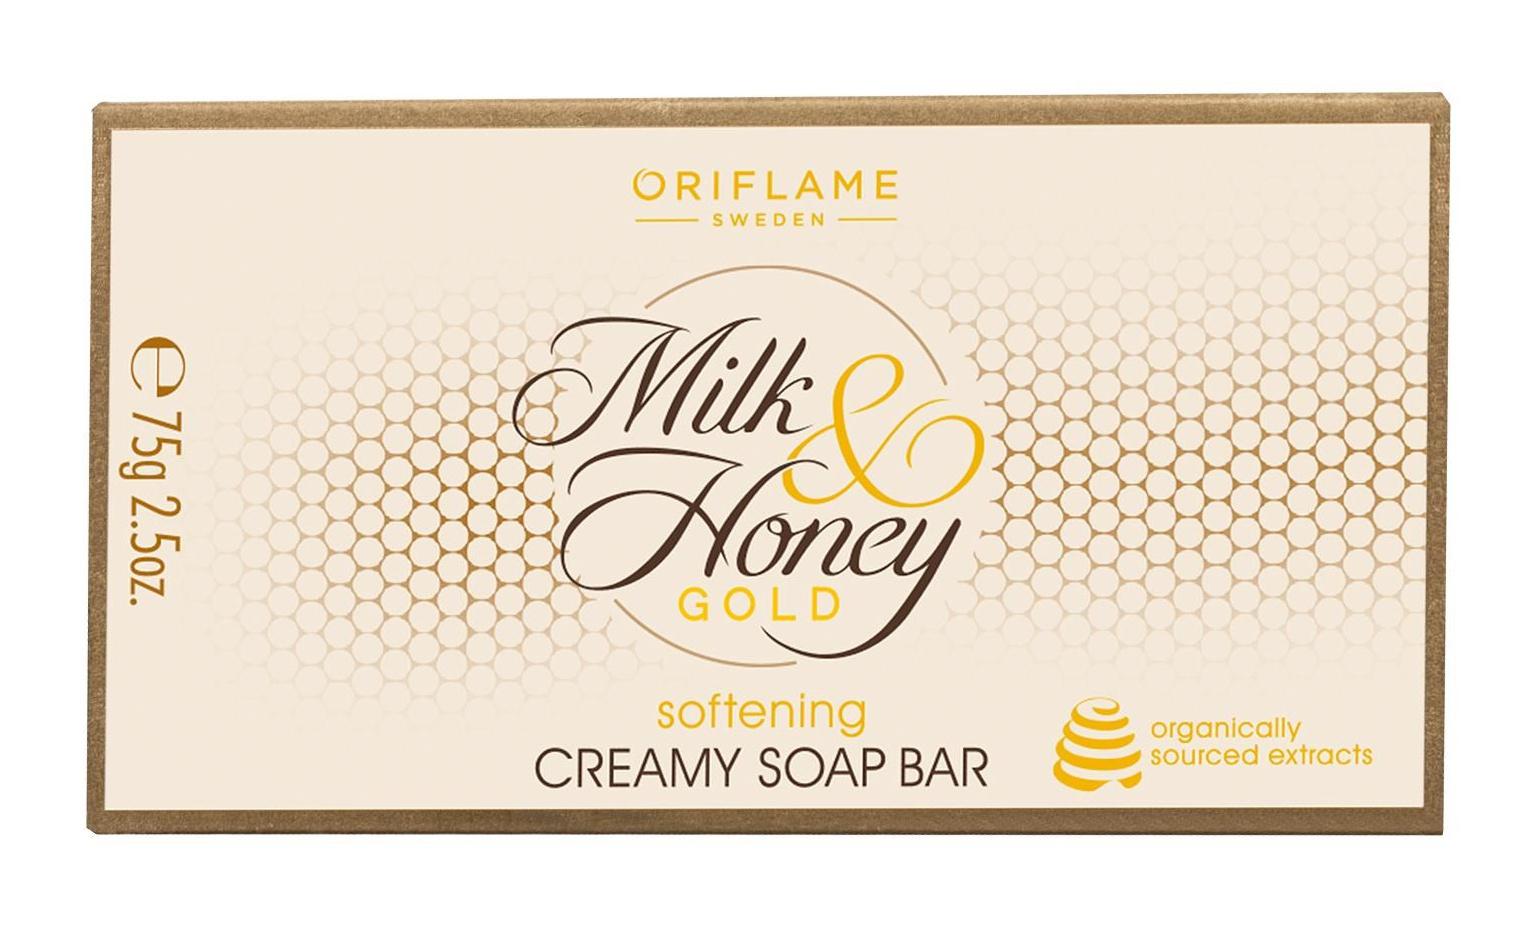 Oriflame Milk & Honey Gold Softening Creamy Soap Bar